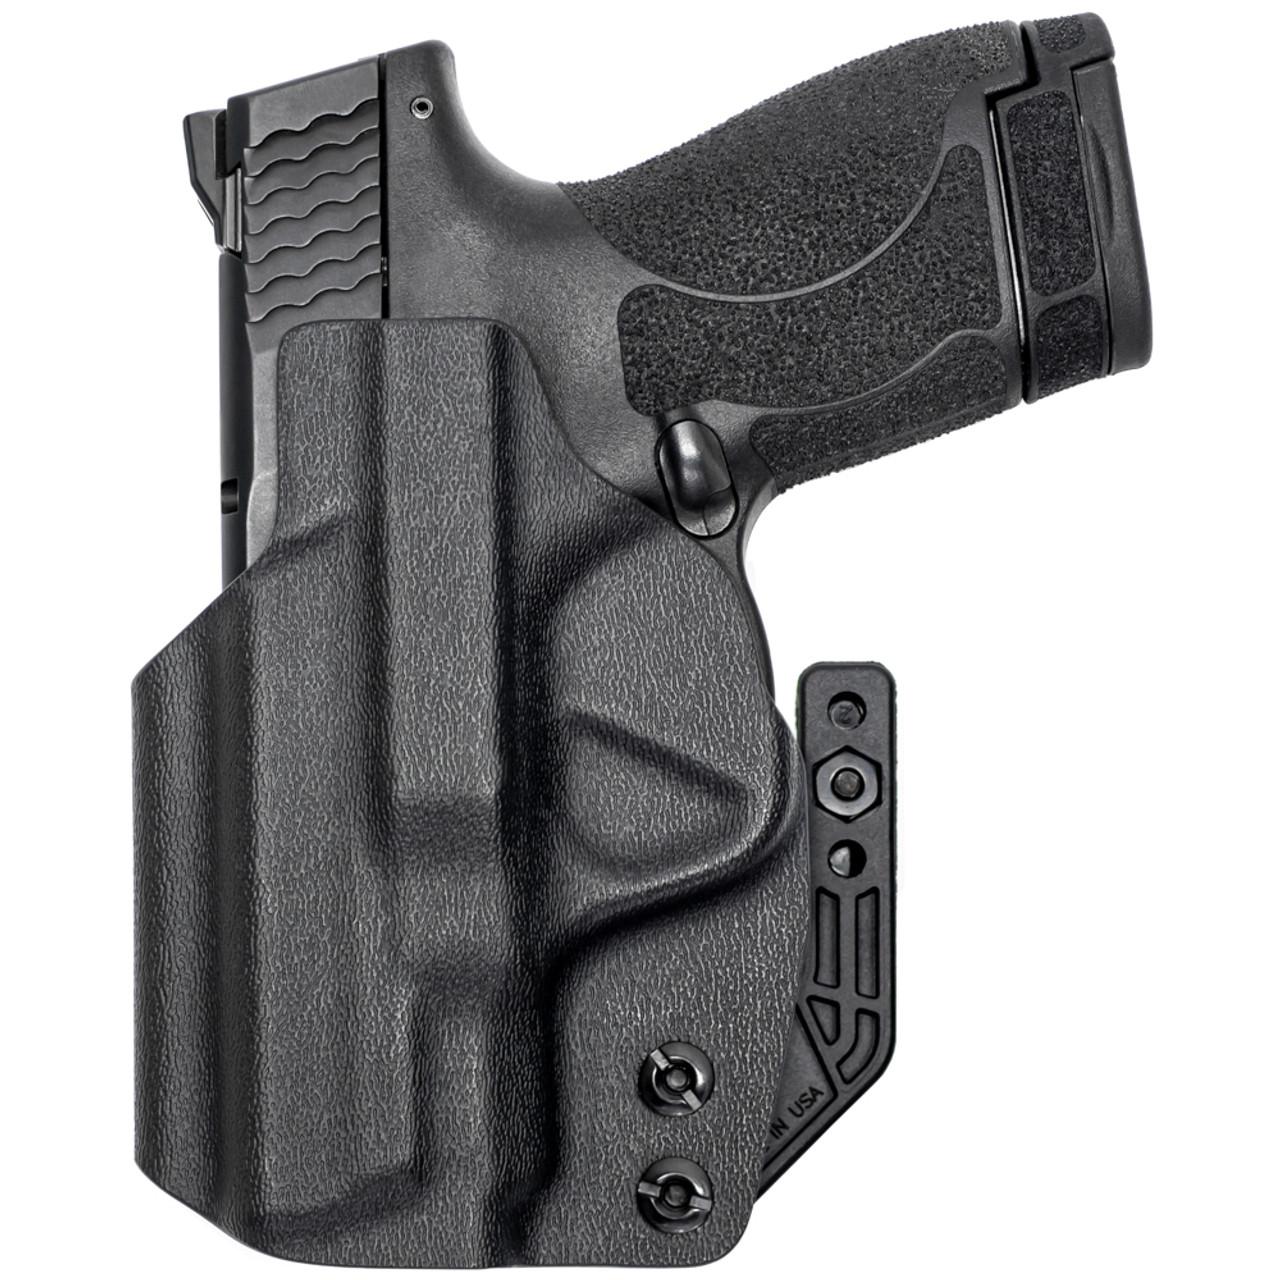 M&P Shield 9mm/.40 - OATH IWB Holster